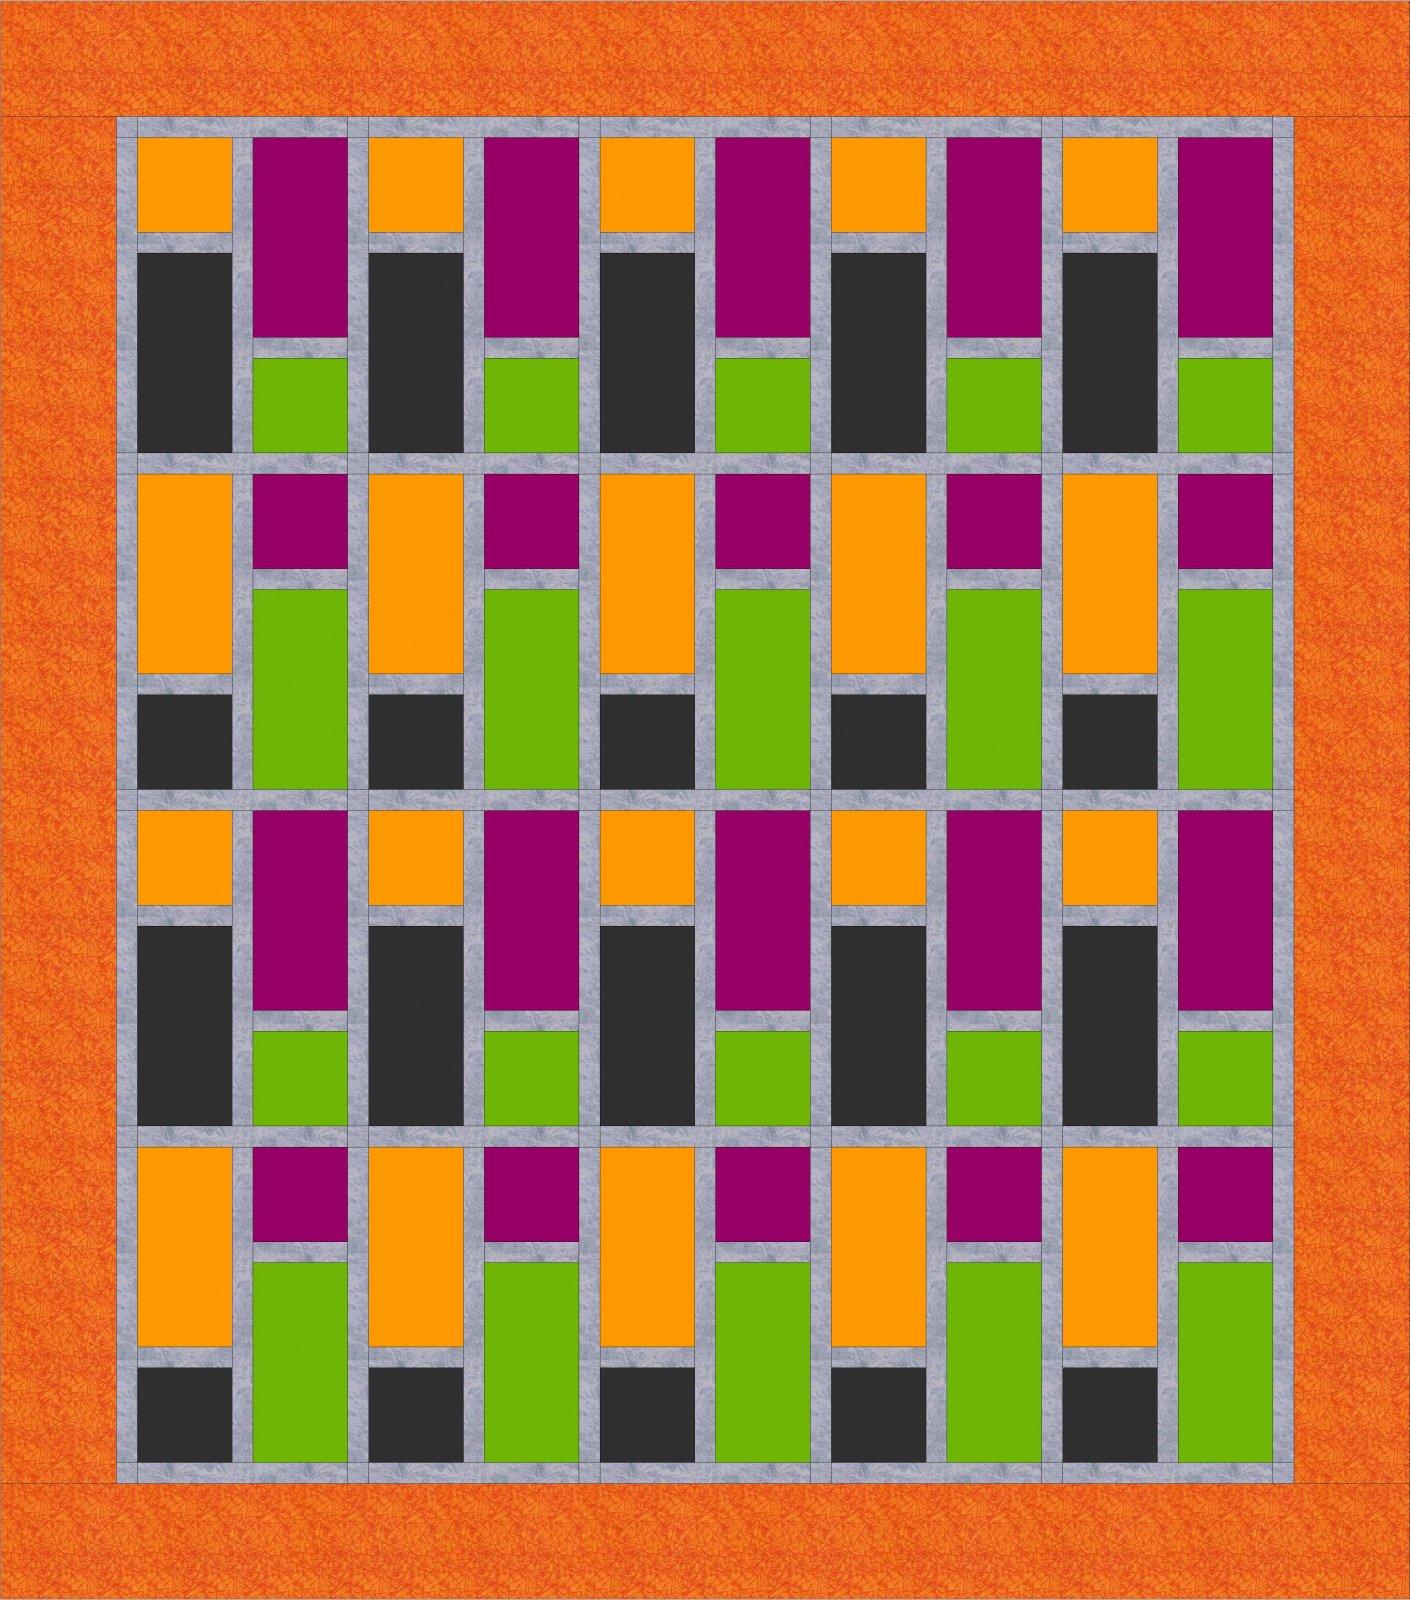 Morse Code Wholesale Reproducible Pattern